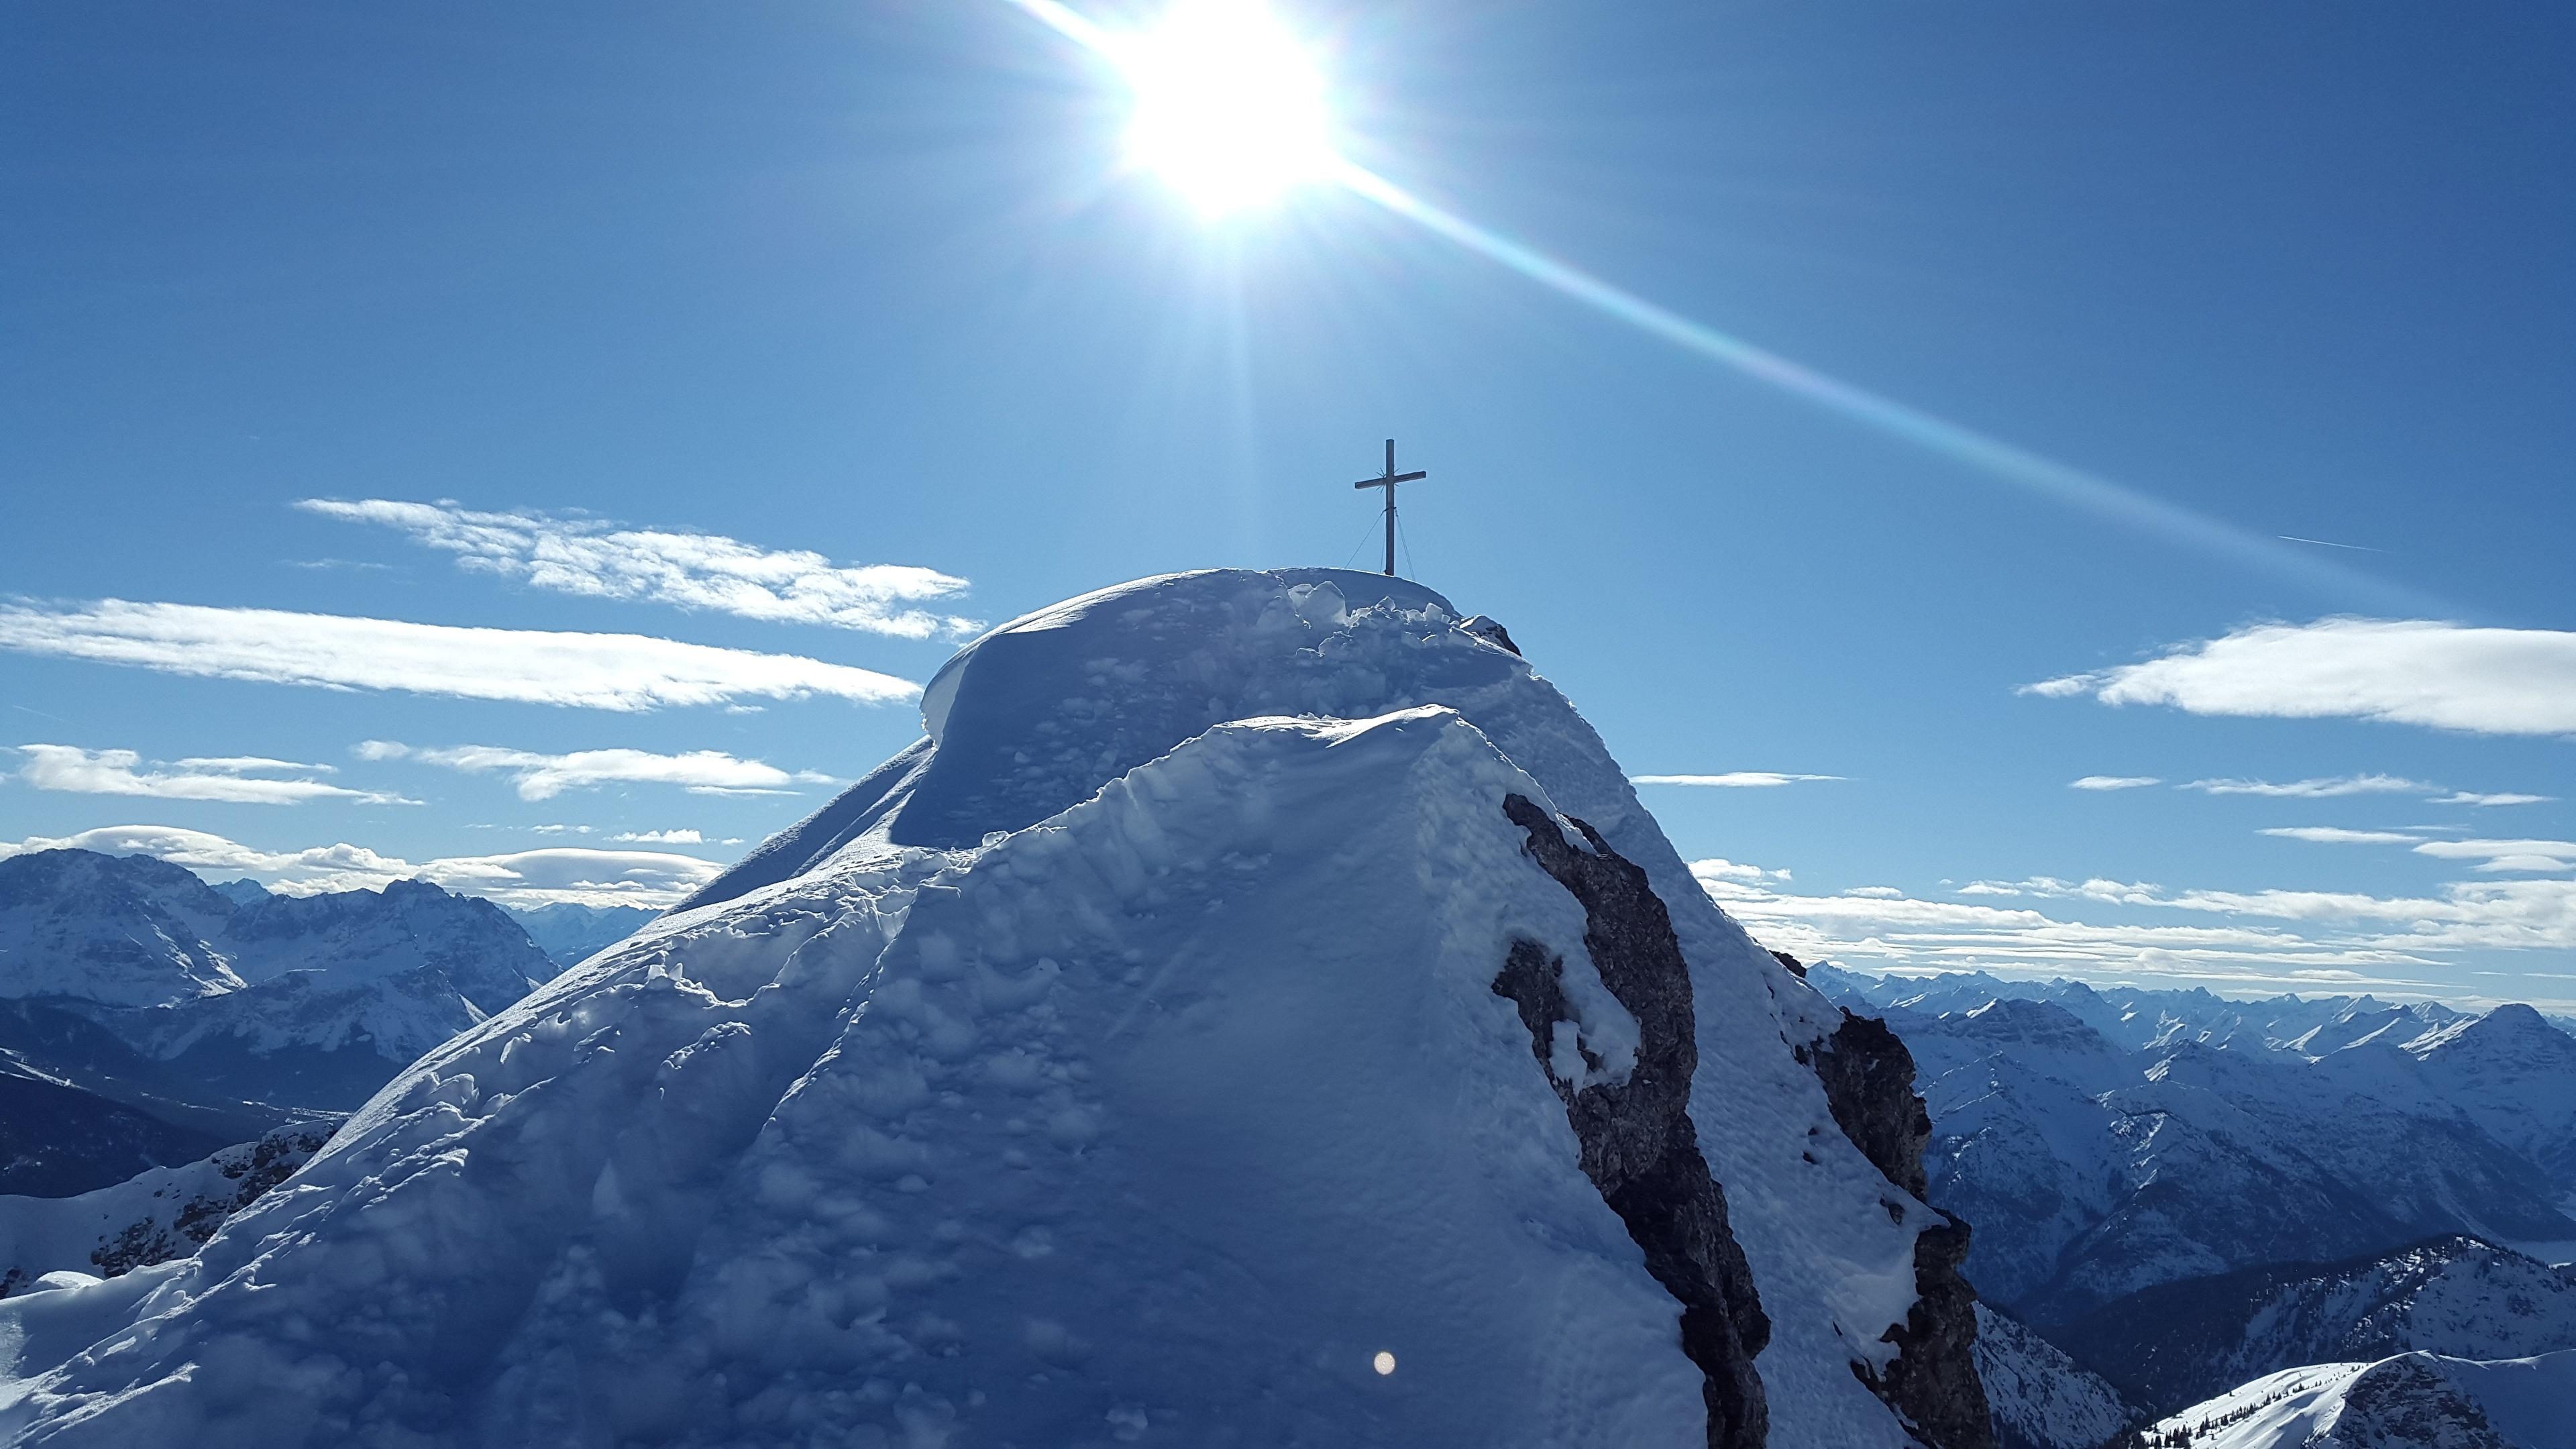 https://s1.1zoom.ru/b5050/842/Mountains_Sky_Crag_Snow_Sun_Cross_556929_3840x2160.jpg